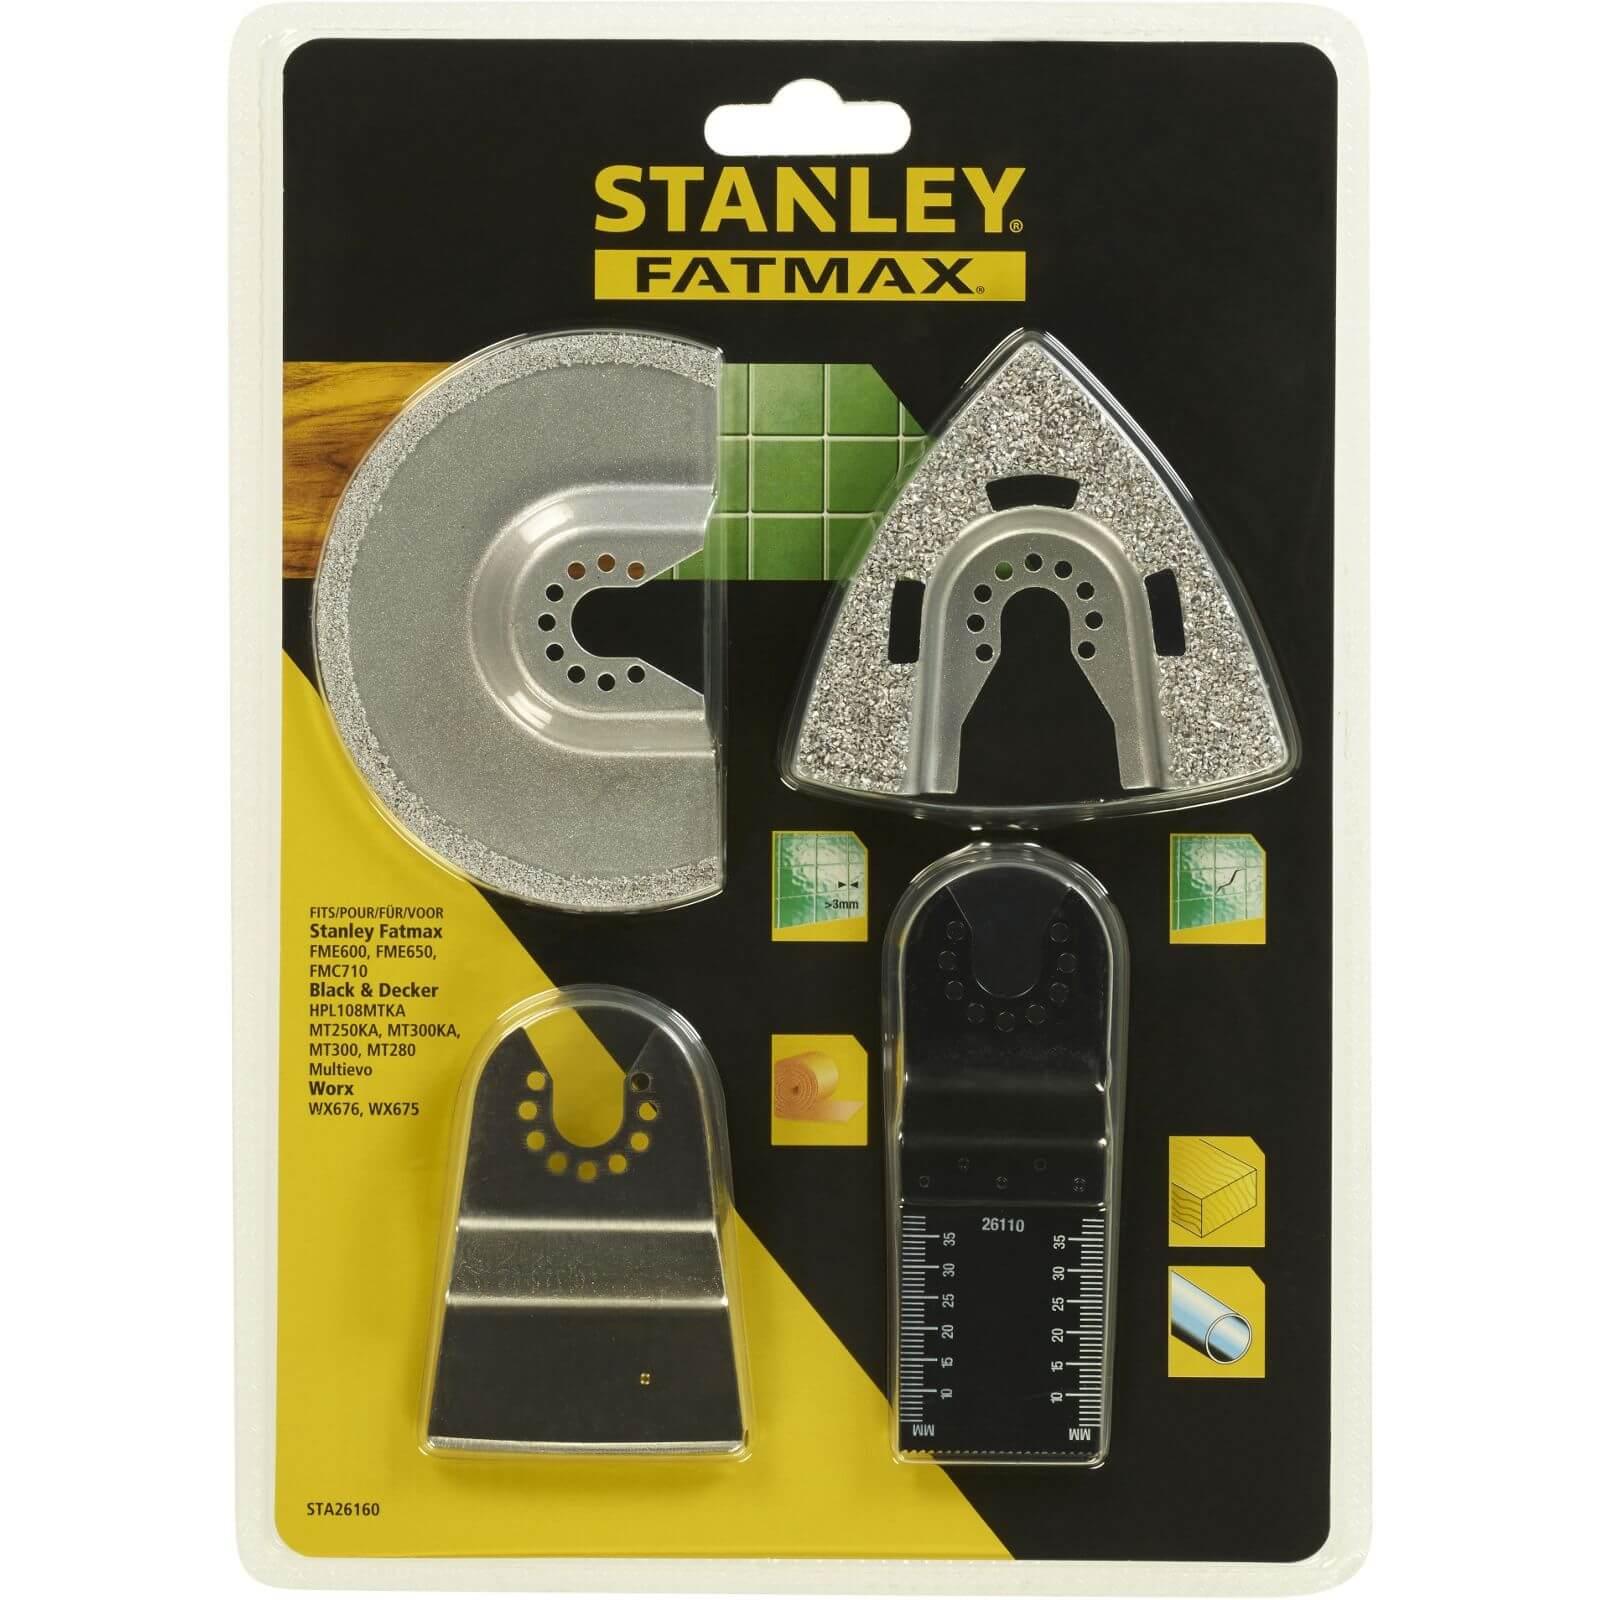 Stanley Fatmax Oscillator Set - 4pc Tiling - STA26160-XJ